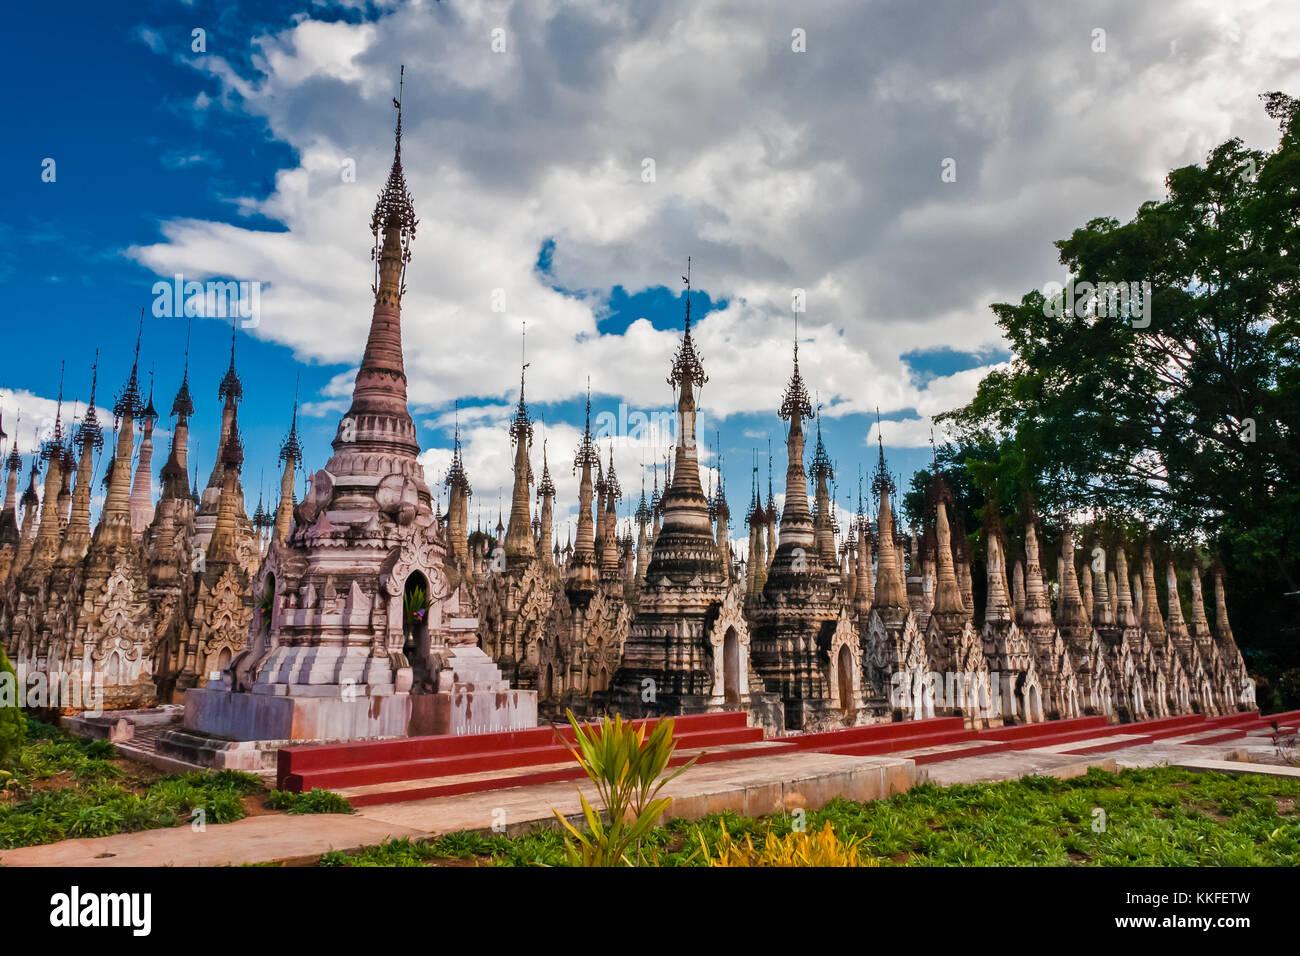 Taunggyi myanmar About